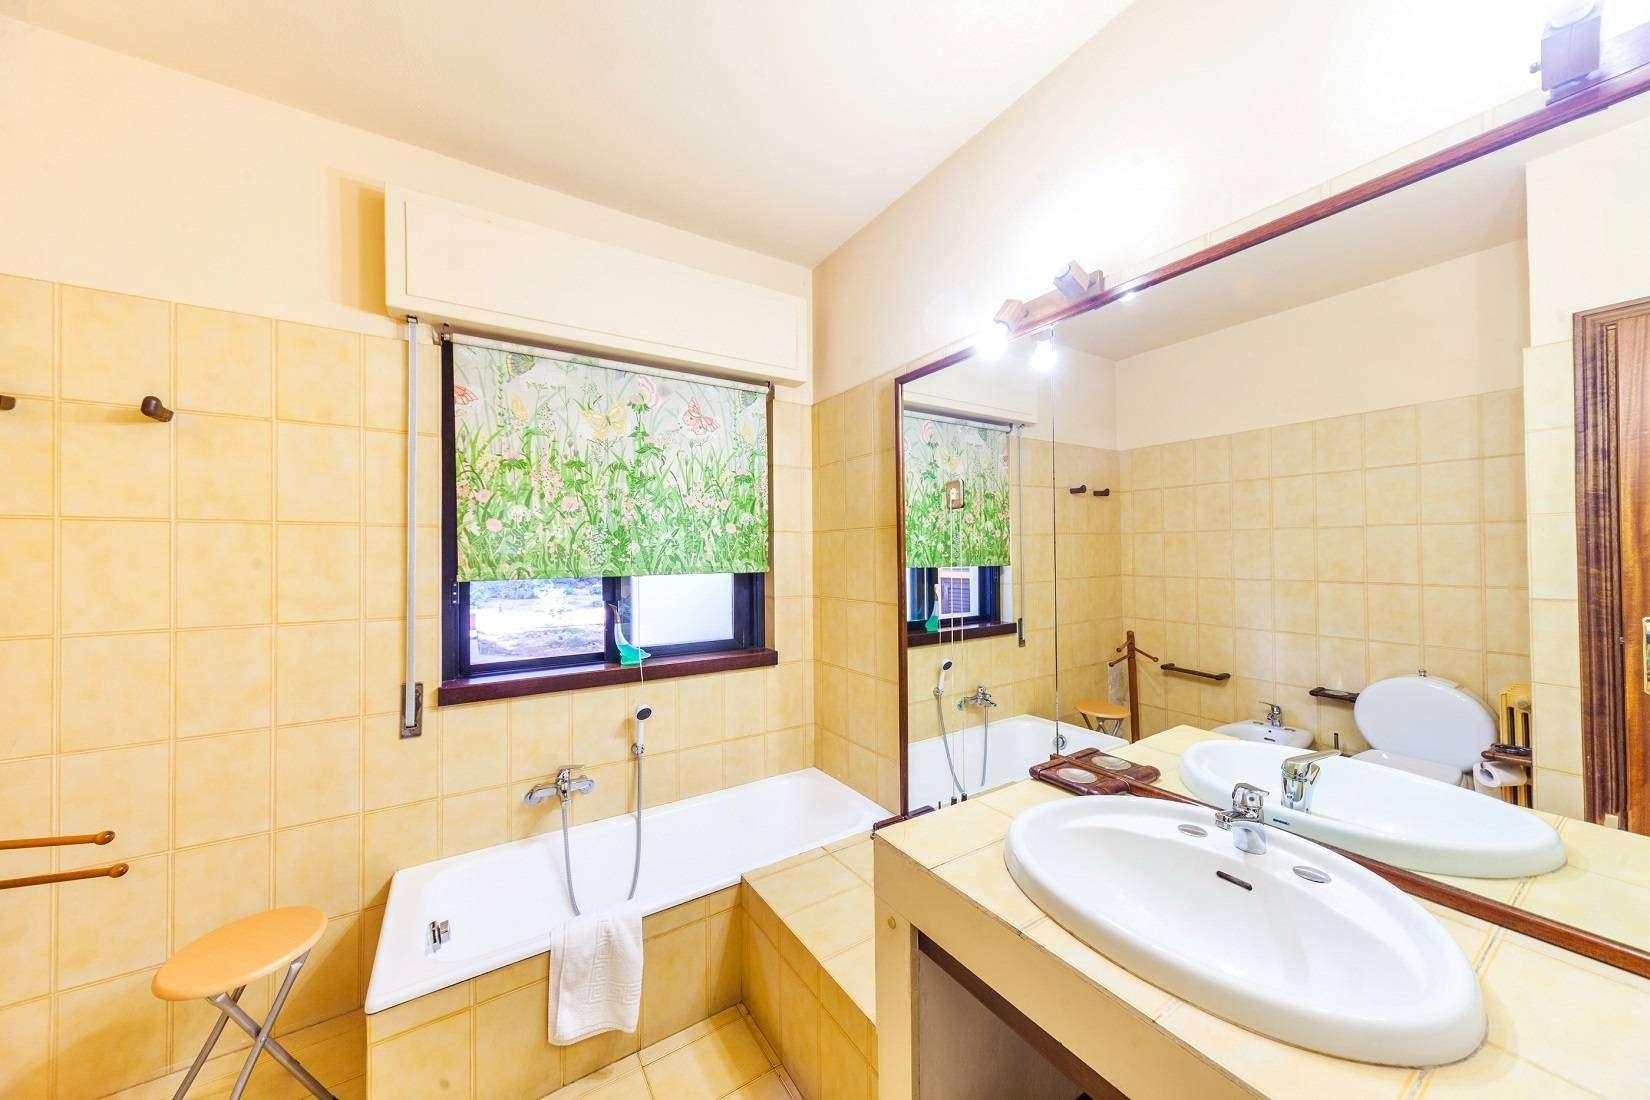 11 Forest Bathroom